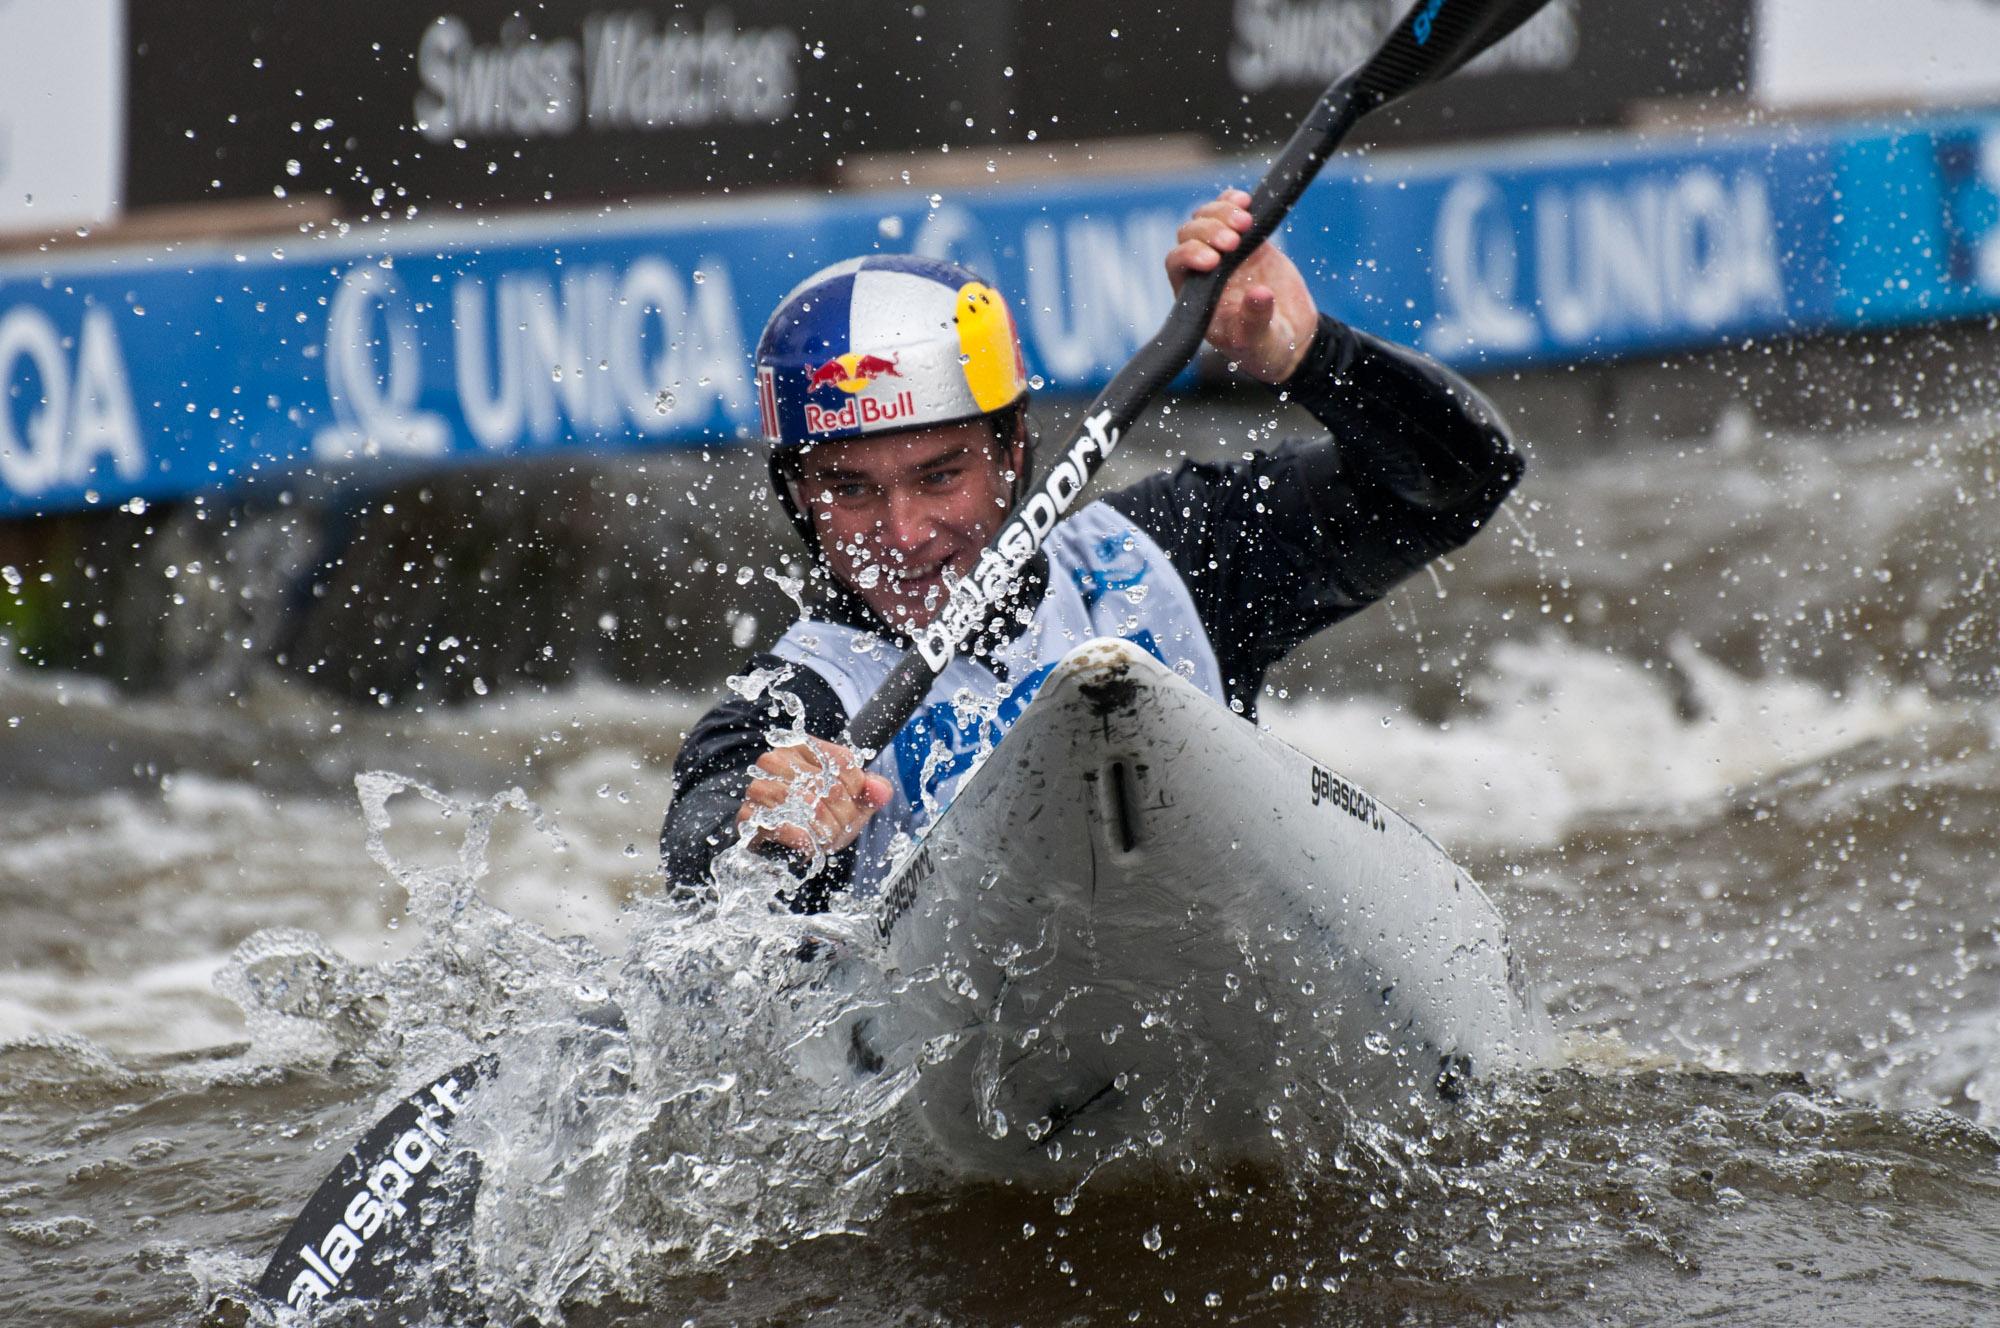 World cup canoe slalom 2012 - Vavřinec Hradílek